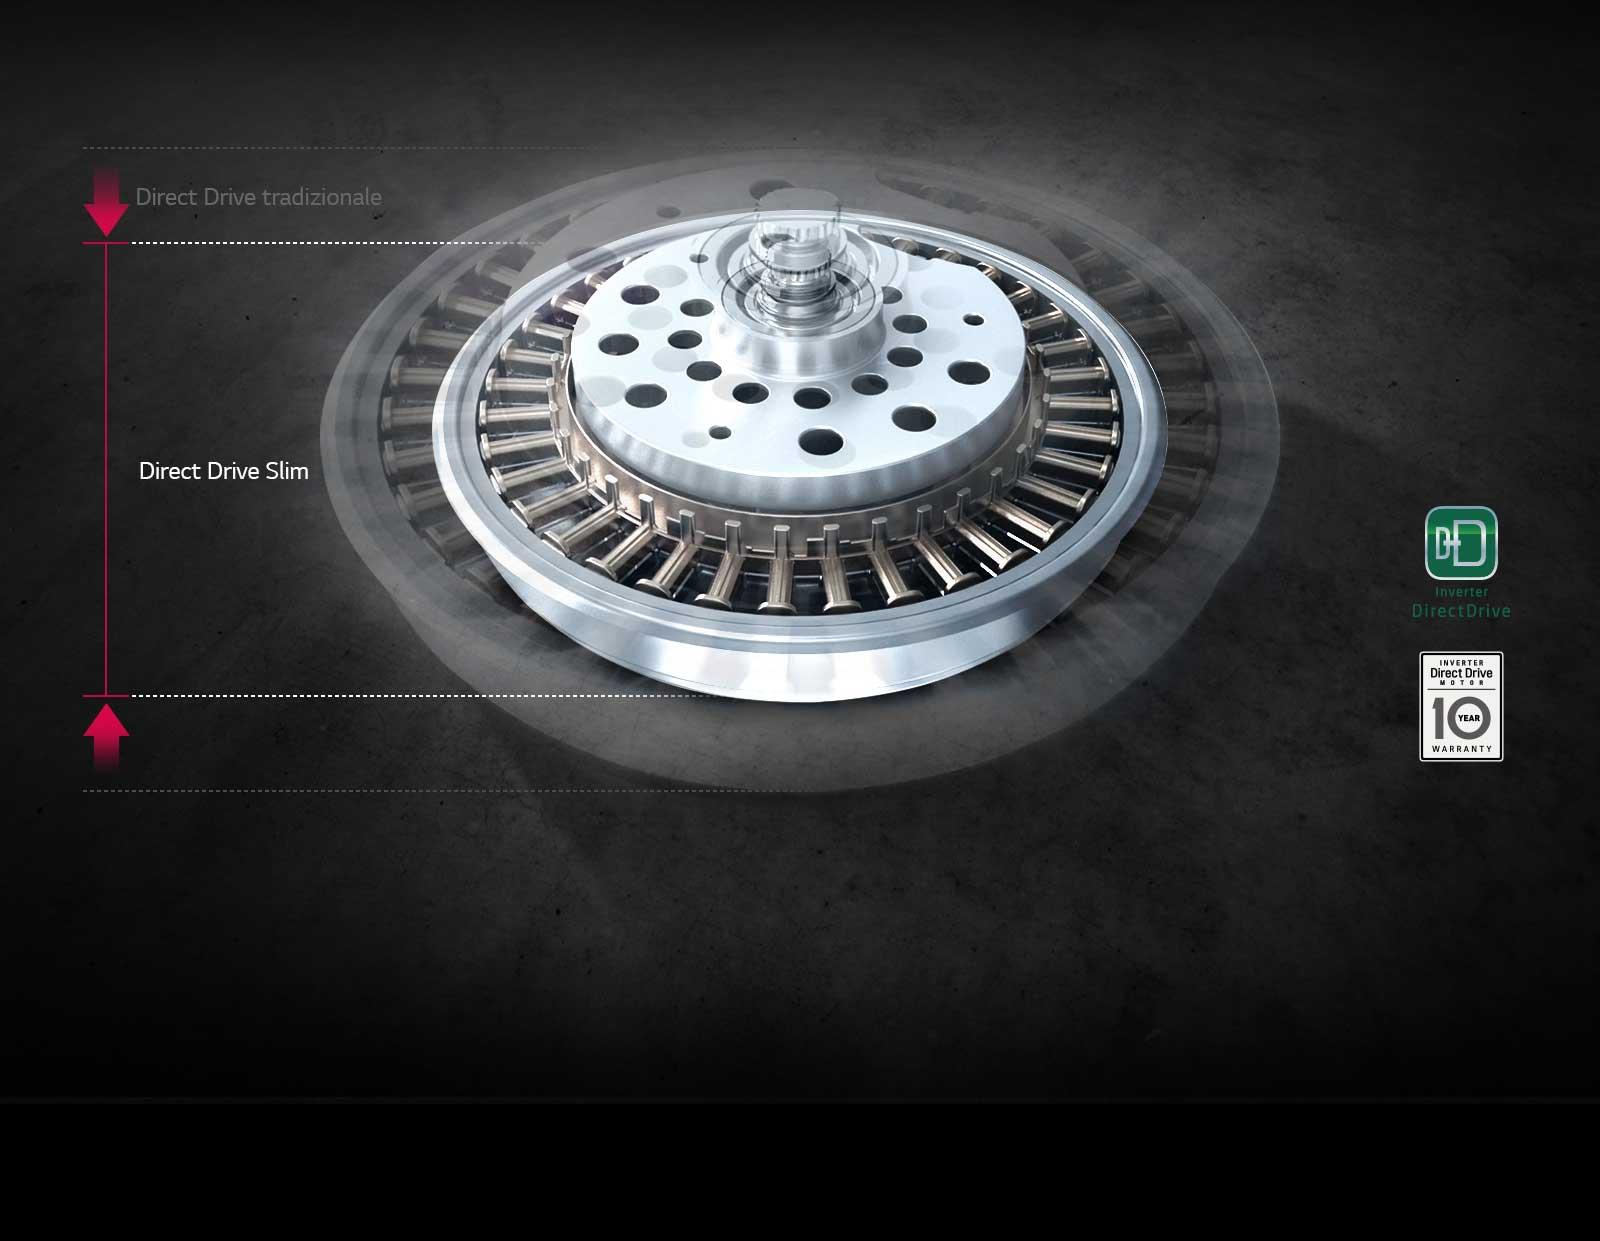 Motore Inverter Direct Drive Slim